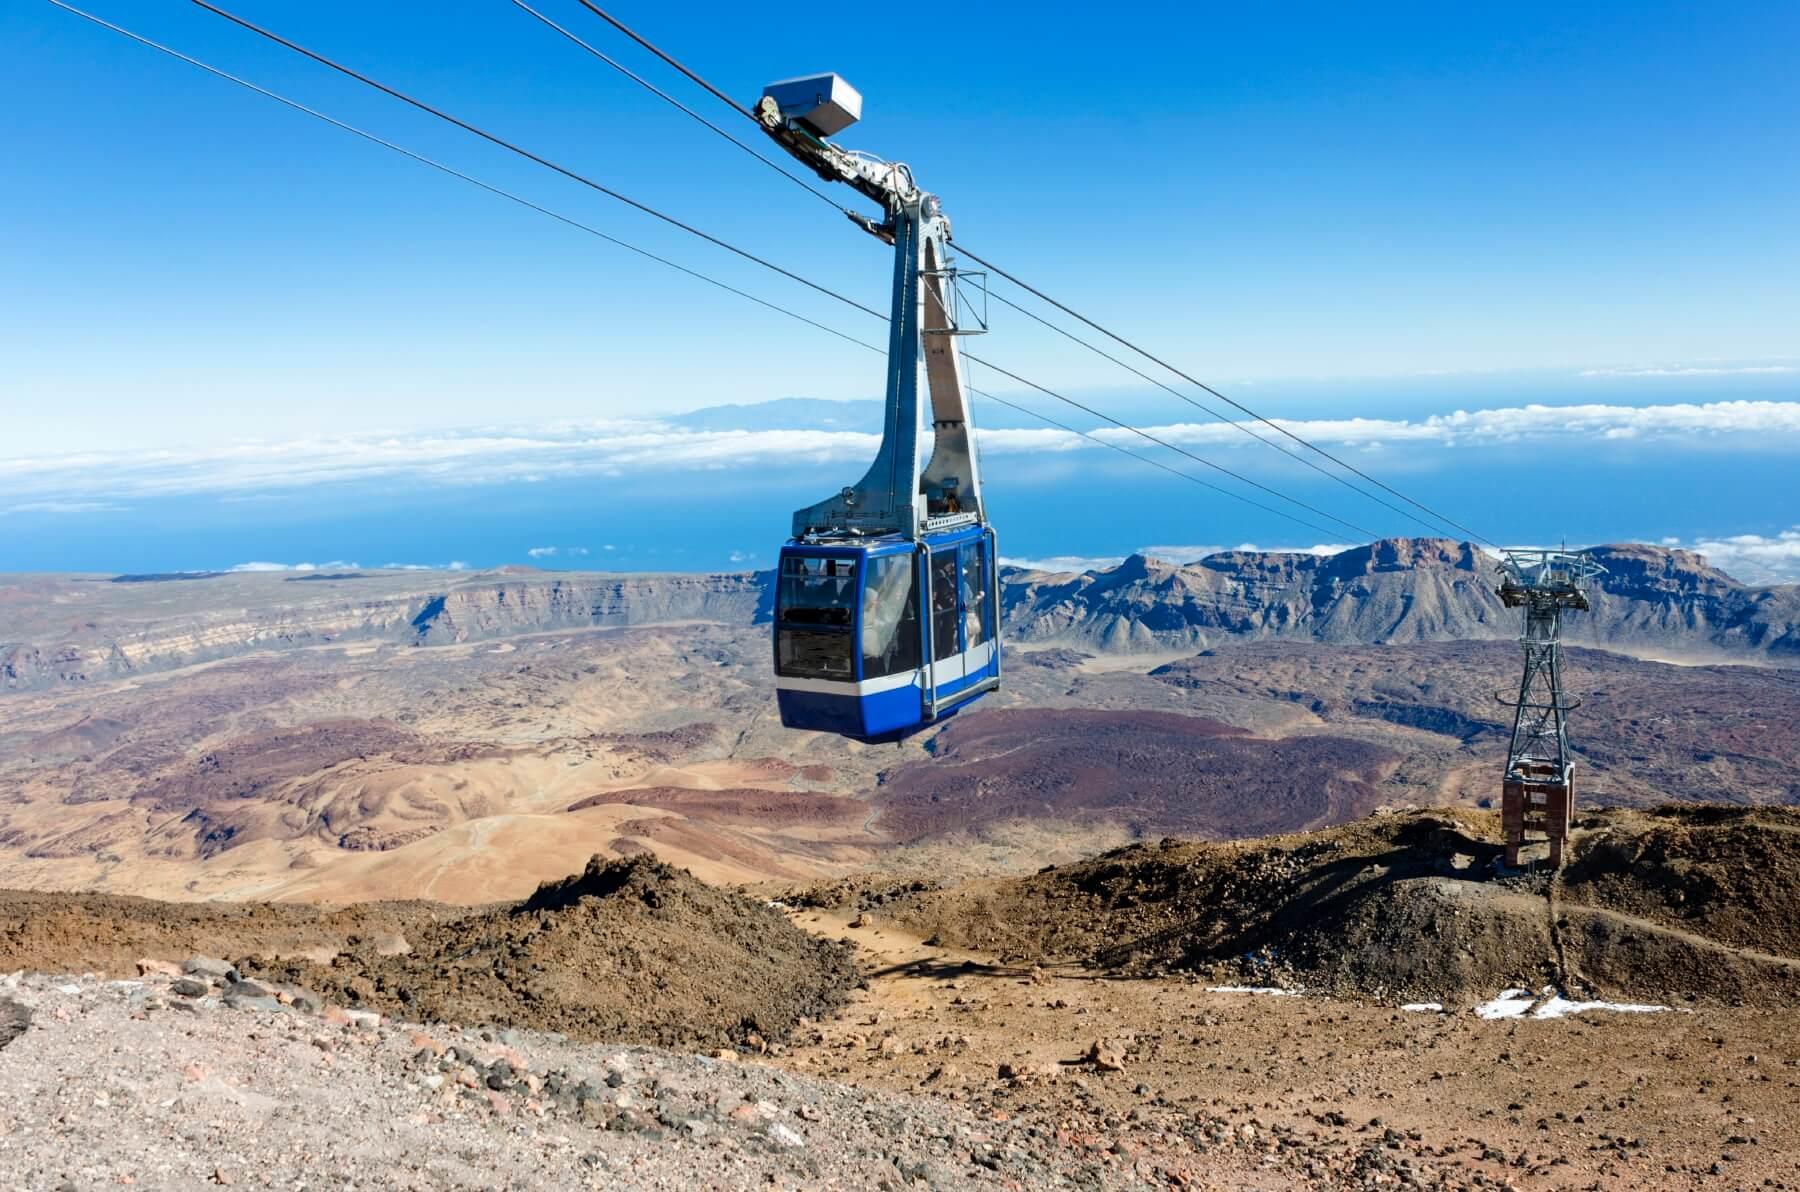 Wanderung in Europa Pico del Teide Teneriffa